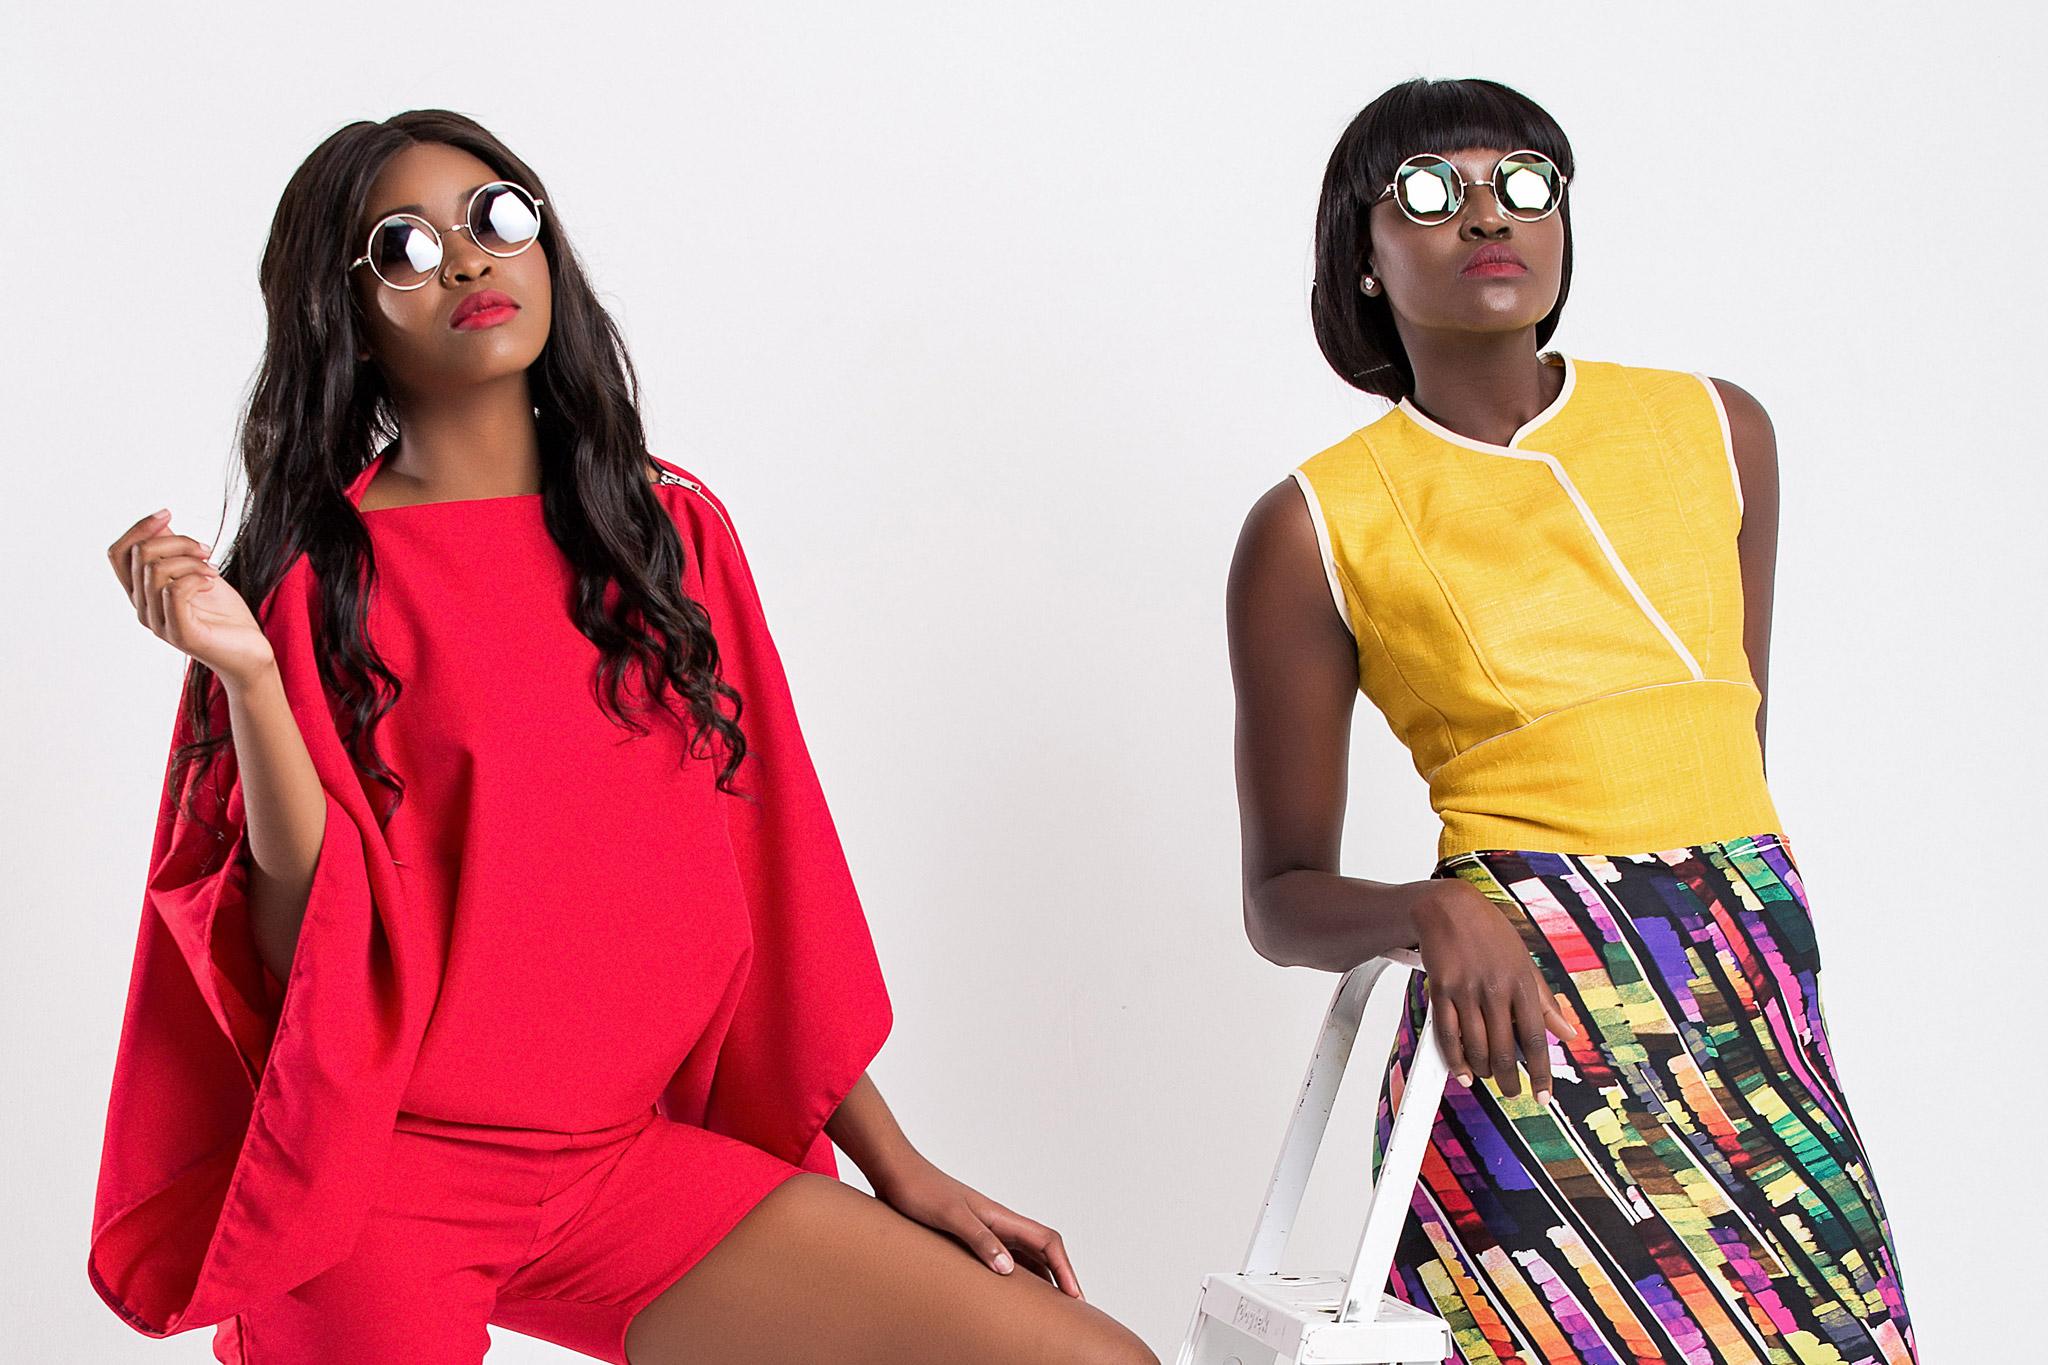 FACE OF AFRICA MAGAZINE 2015  Creative Directors: Shumirayi Tsungu &Cynthia Musaphili Wright //Models: Lizzy Emil, Najat Shuruma, Astrid Tshidibu,Wendy Ruwiza // Designers: Siss On Bare - Intan Zuhuri, Jonte Deseigns - Jonte Pike, Perfect Black Dress -Danijela Kambaskovic, Zamora Shoes // Make-up: Amy-Lee Danieli & Anaka // Hair: Miranda Jade & Edith Hair Plus